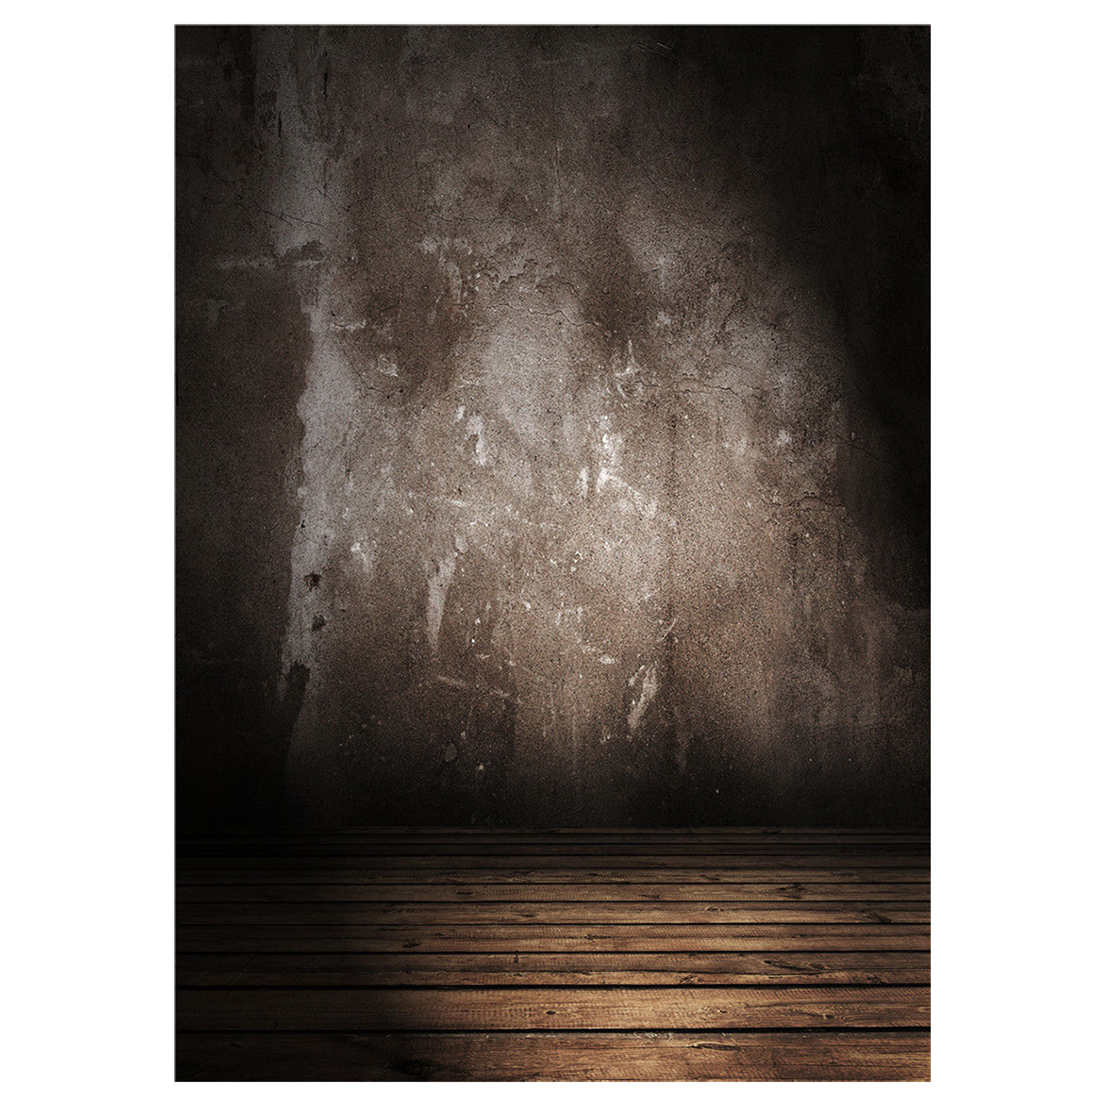 SCLS Retro Background Wood Floor Photo Studio Props Photography Backdrops Vinyl 5x7FT